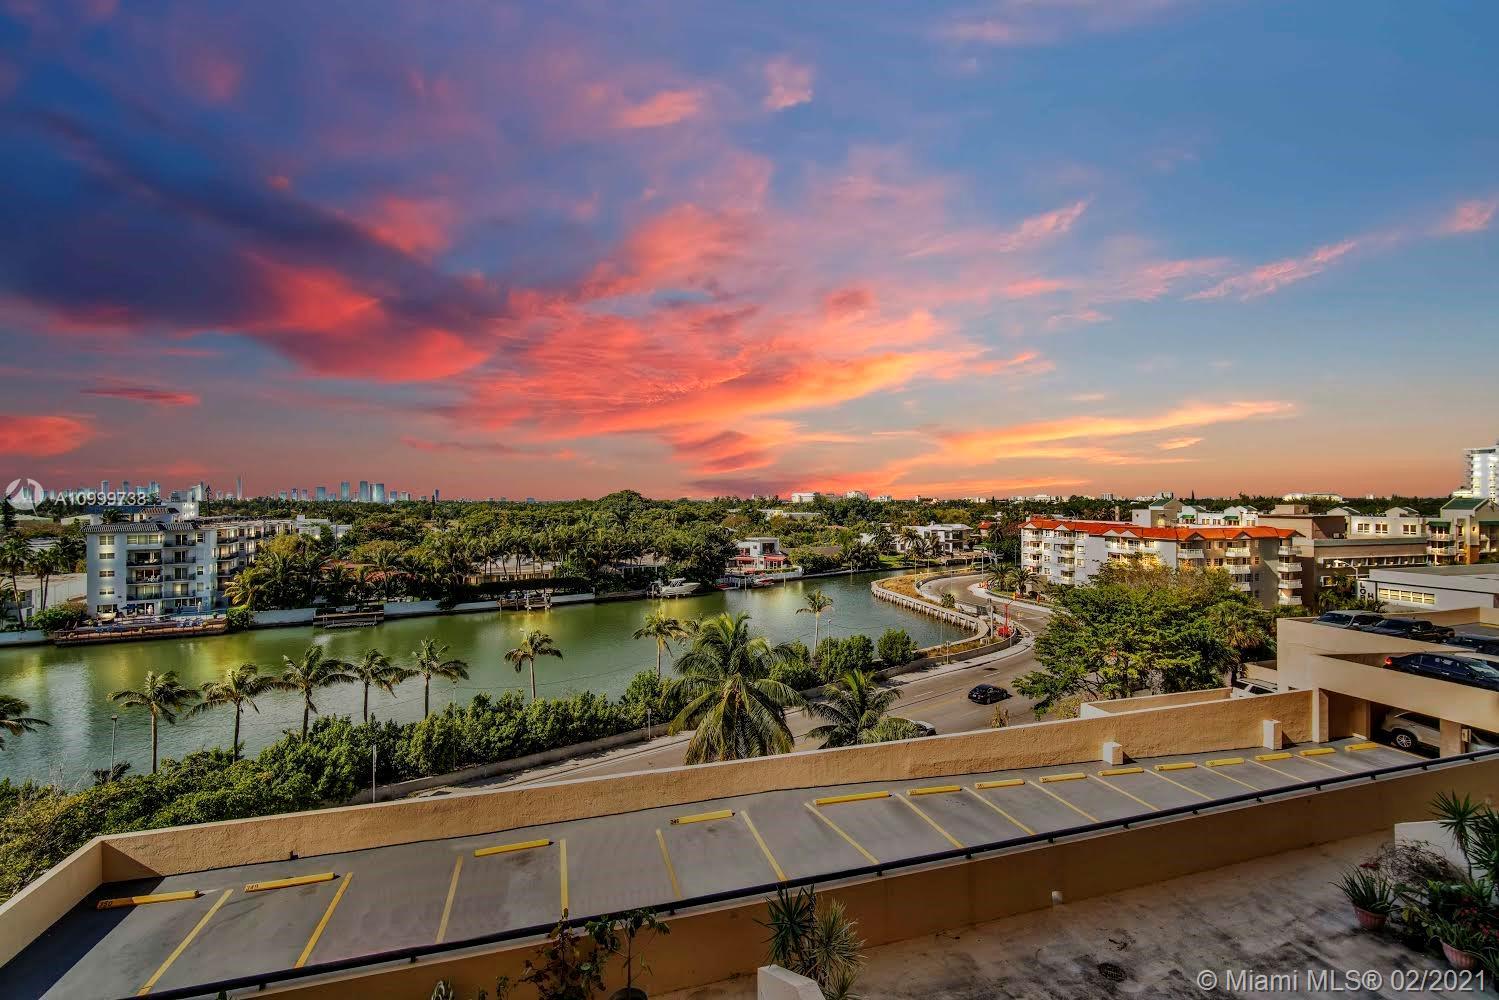 Club Atlantis #810 - 2555 Collins Ave #810, Miami Beach, FL 33140